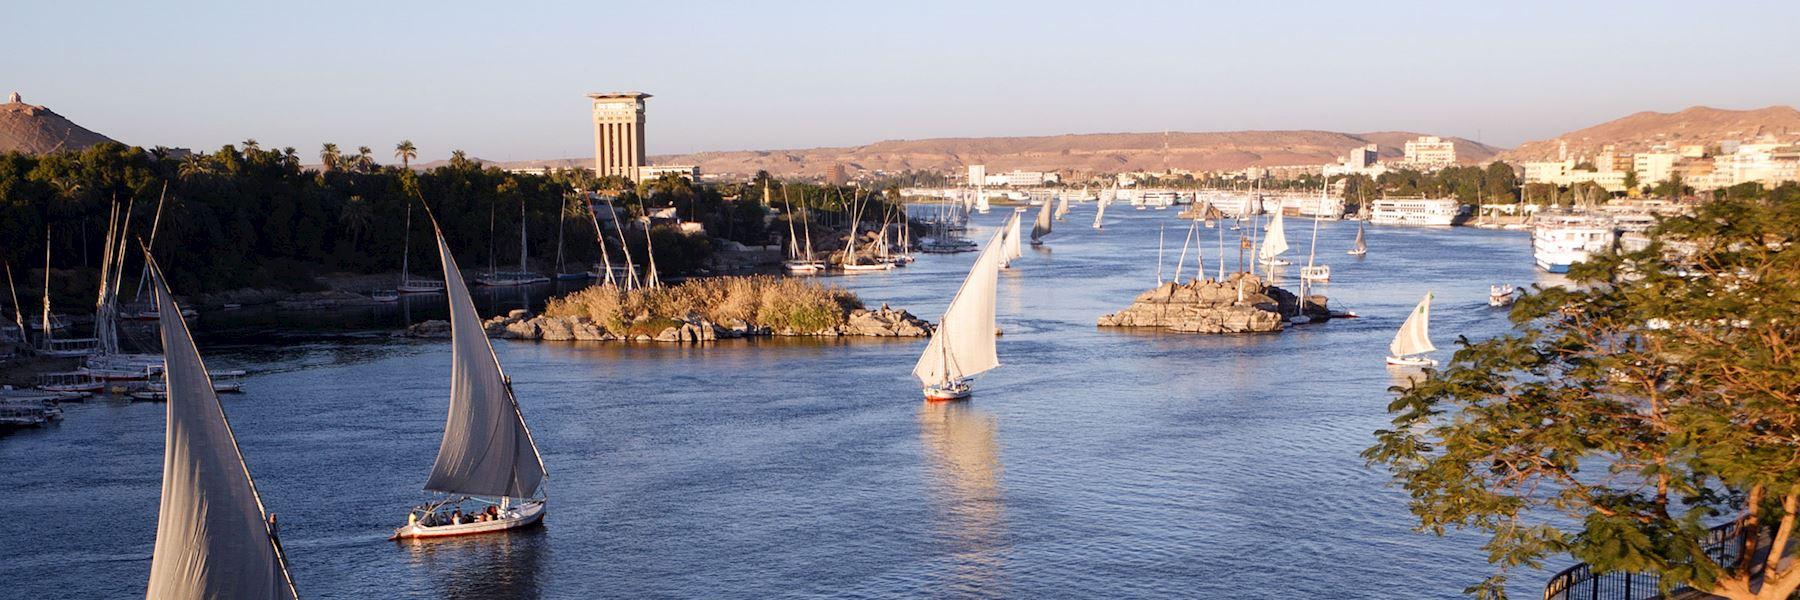 Visit Aswan, Egypt